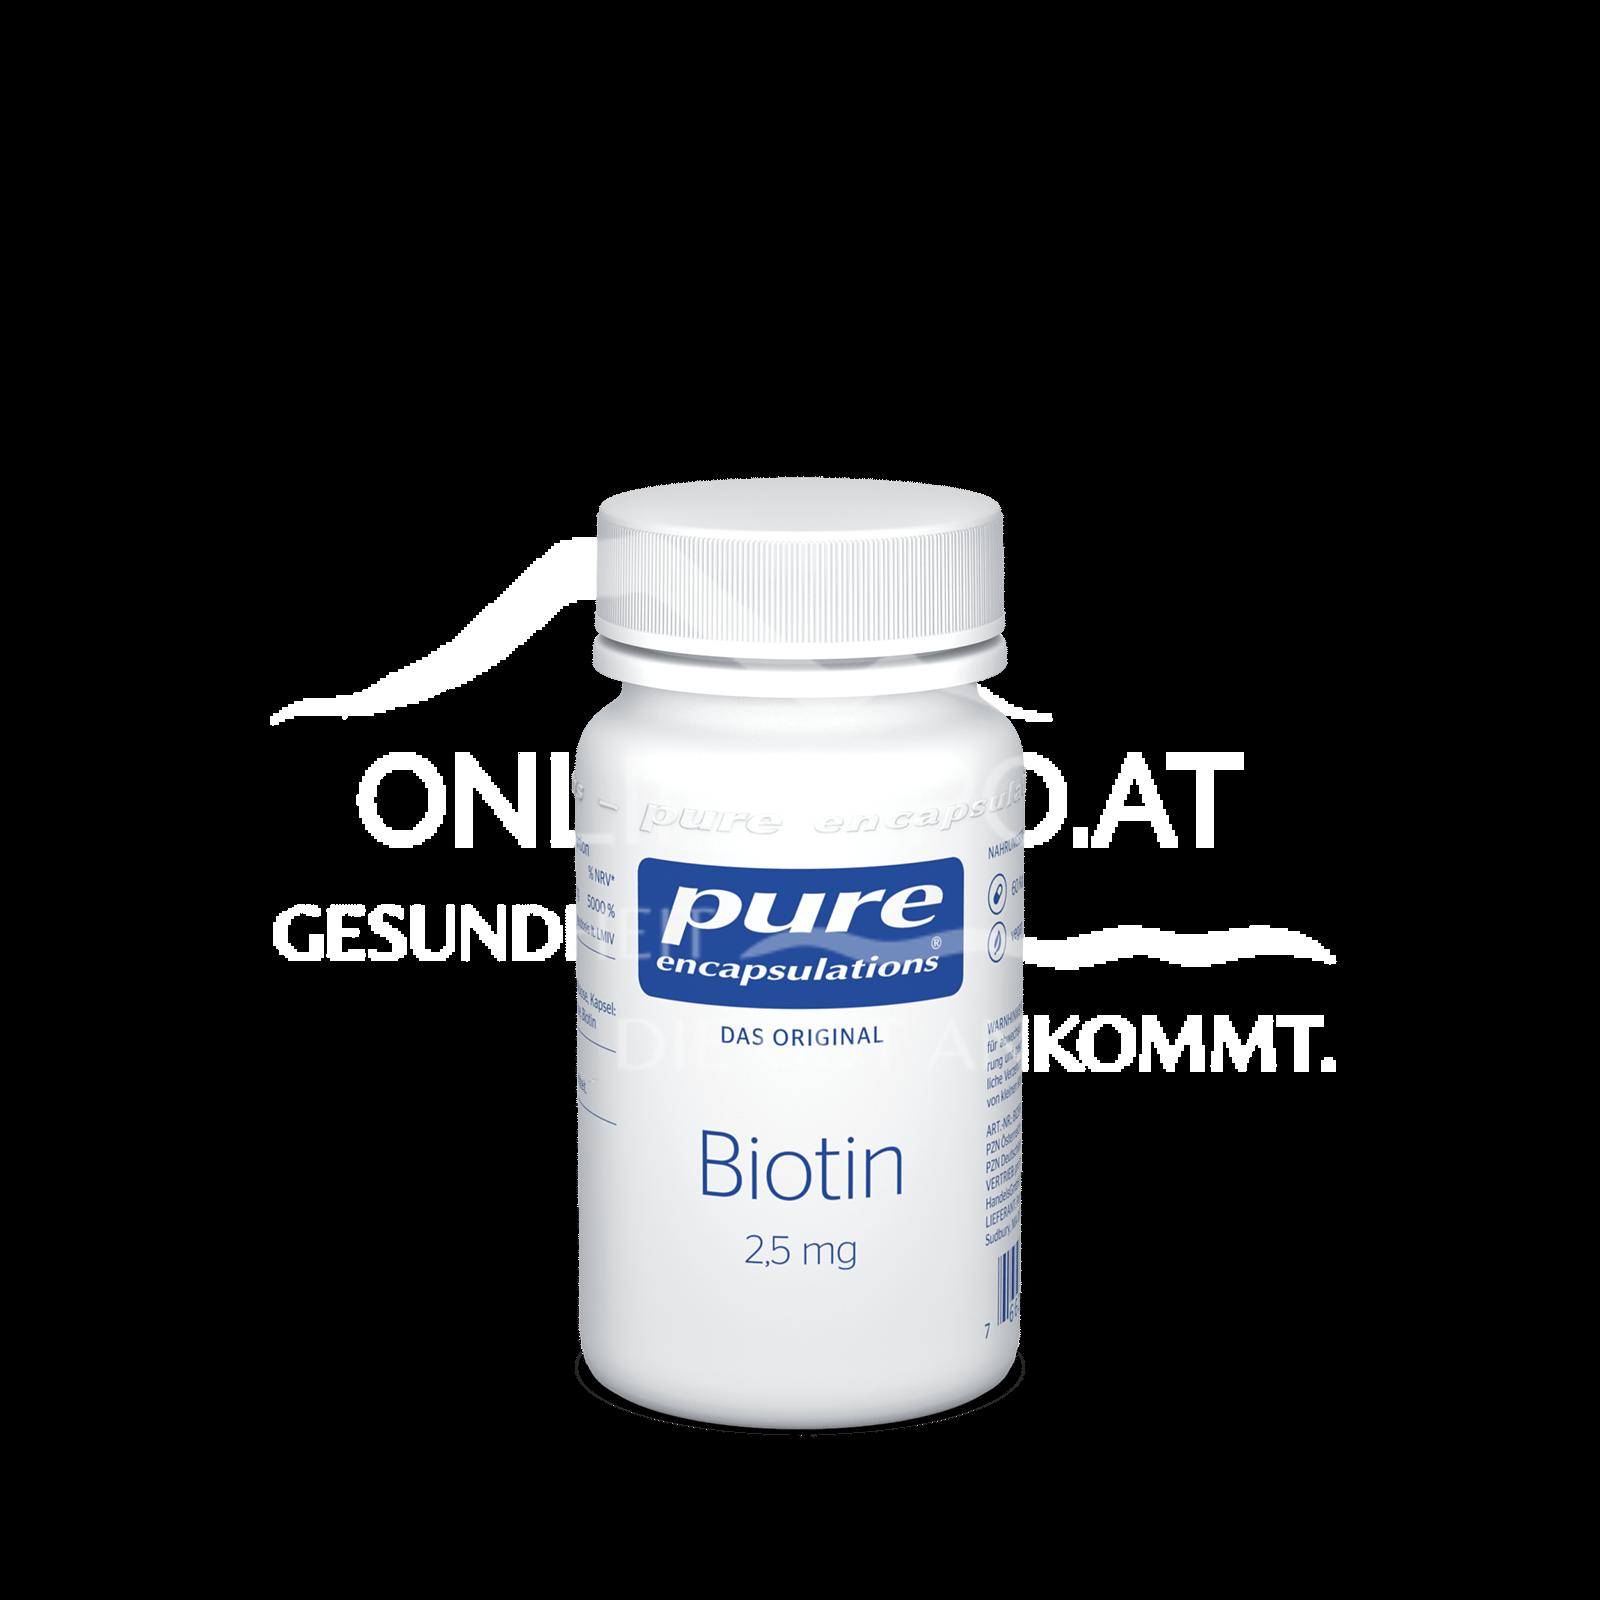 pure encapsulations® Biotin 2,5 mg